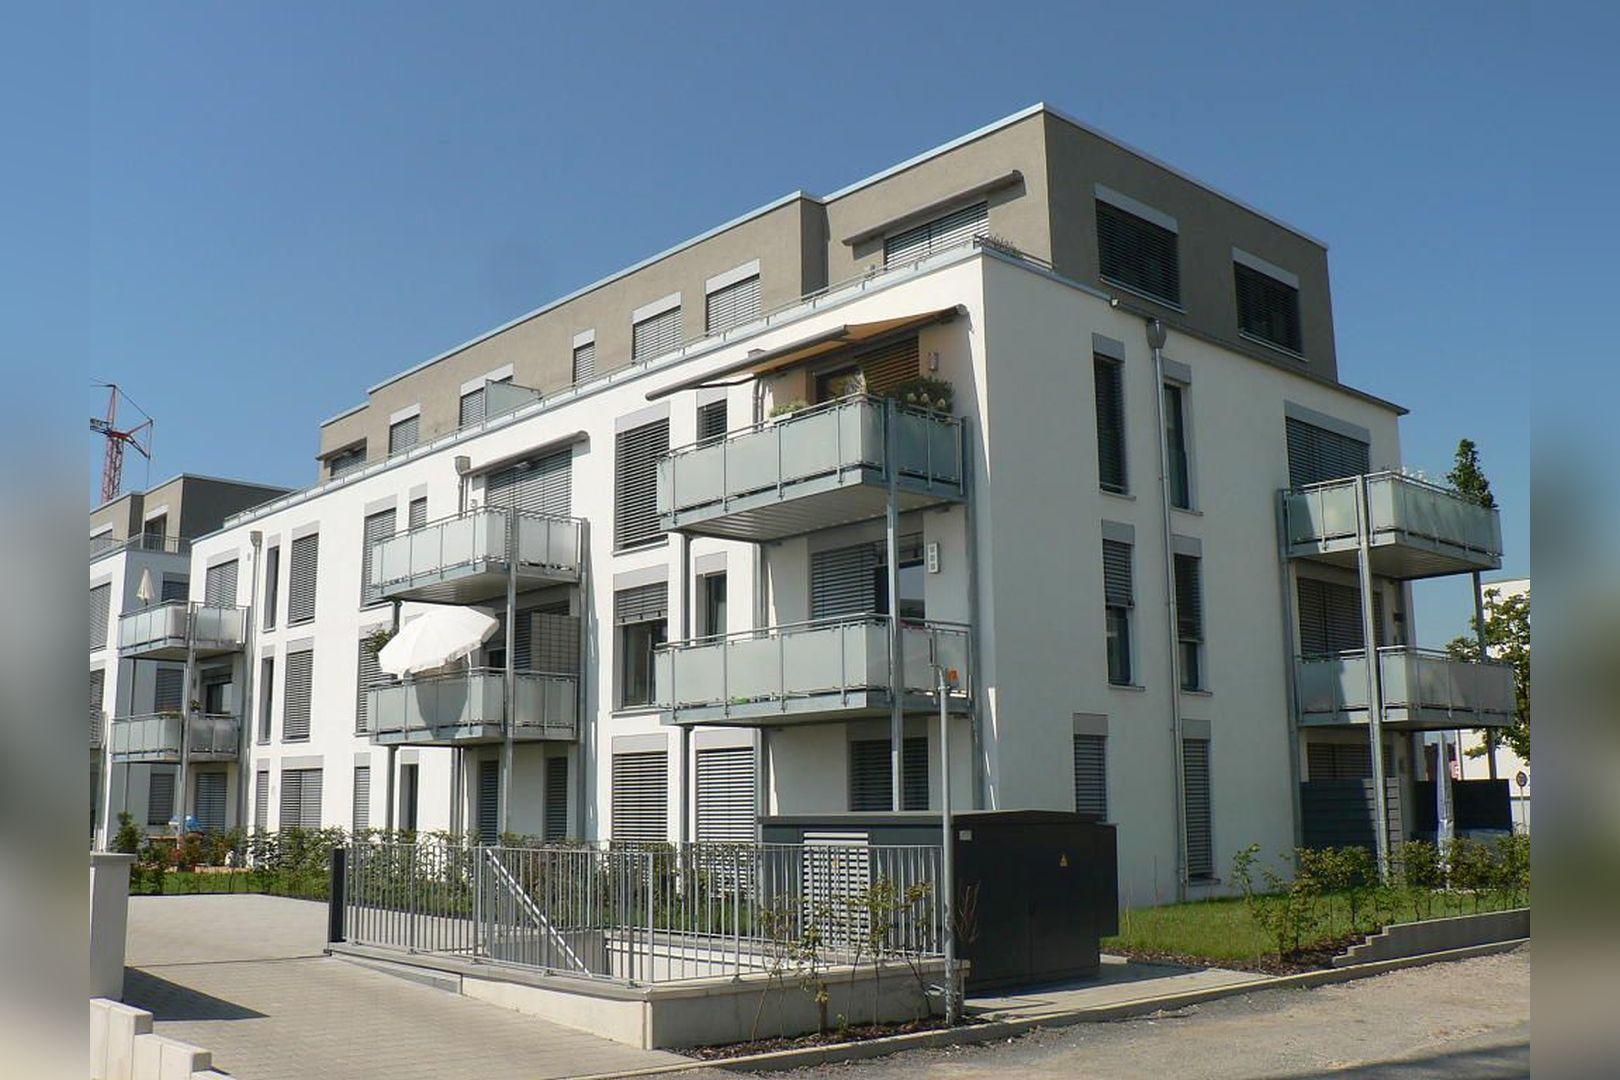 Immobilie Nr.Köln 100 | Unter Linden 127-141, Am Aspelkreuz 2-28, 50859 Köln-Widderdorf